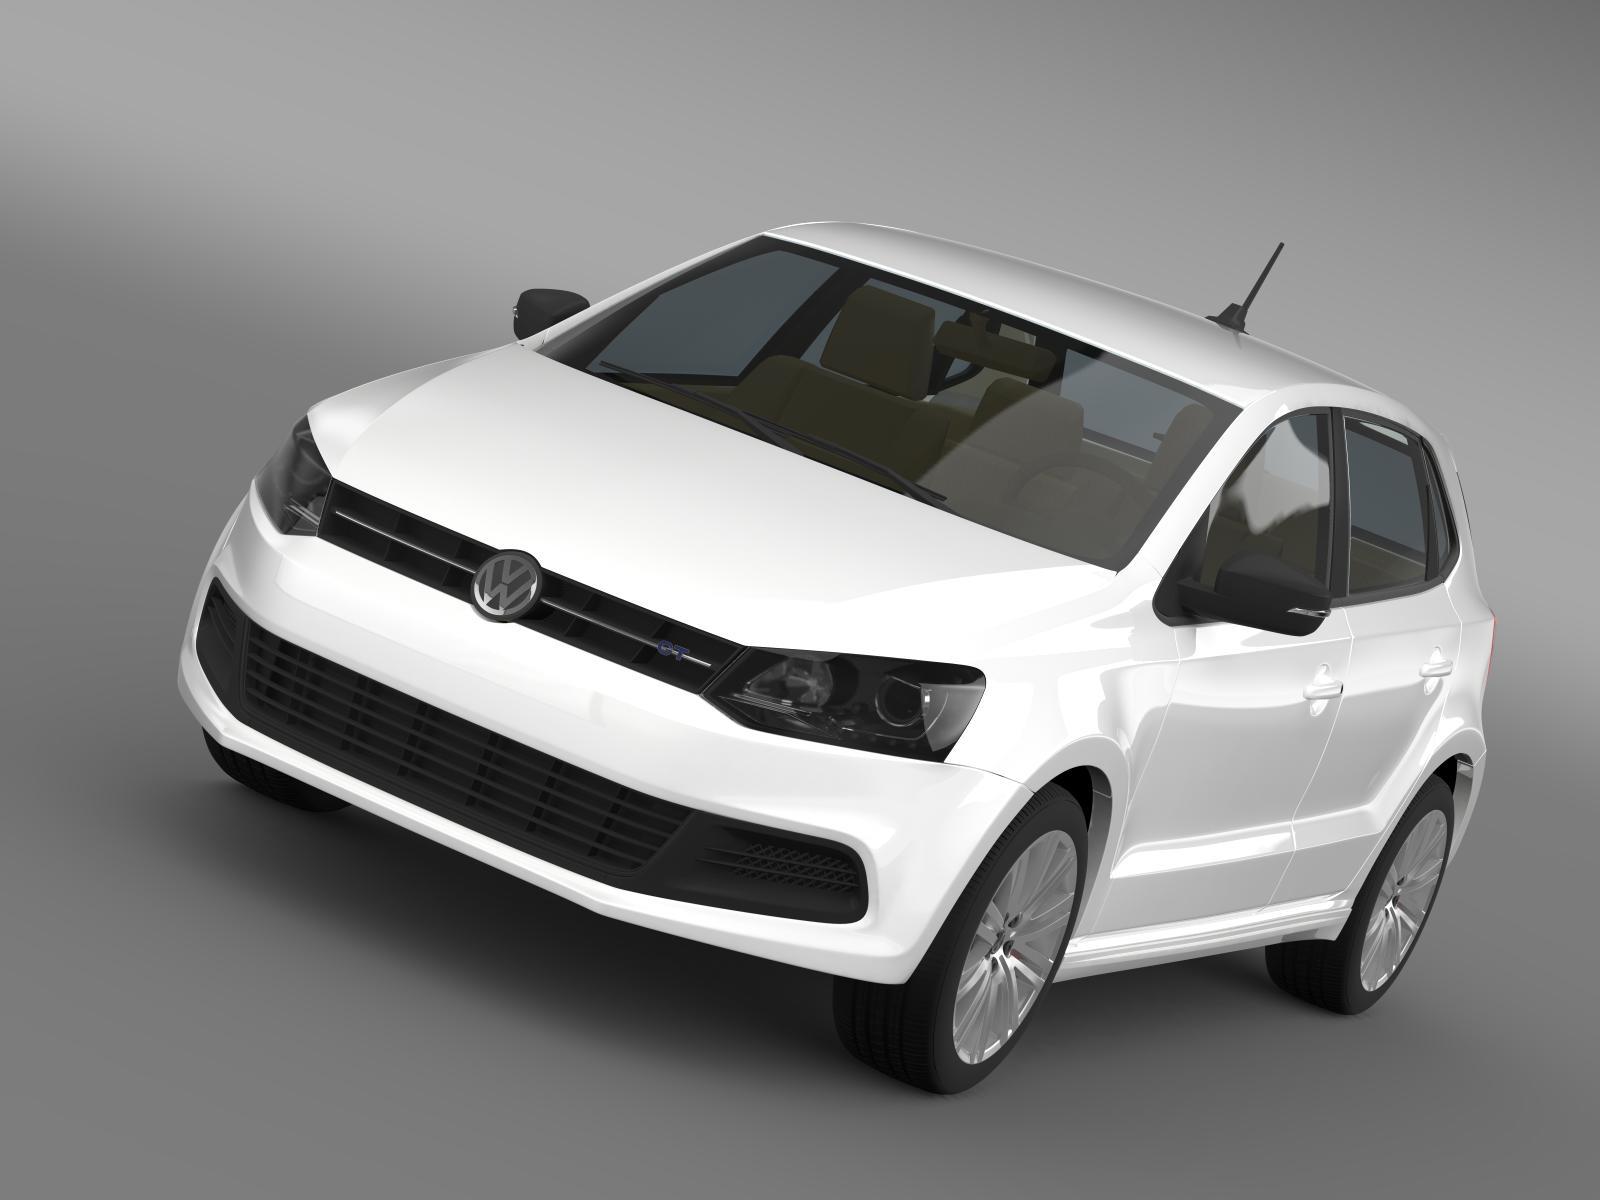 Volkswagen polo bluegt 5d 2009-2013 3d líkan 3ds hámark fbx c4d lwo ma mb hrc xsi obj 161918